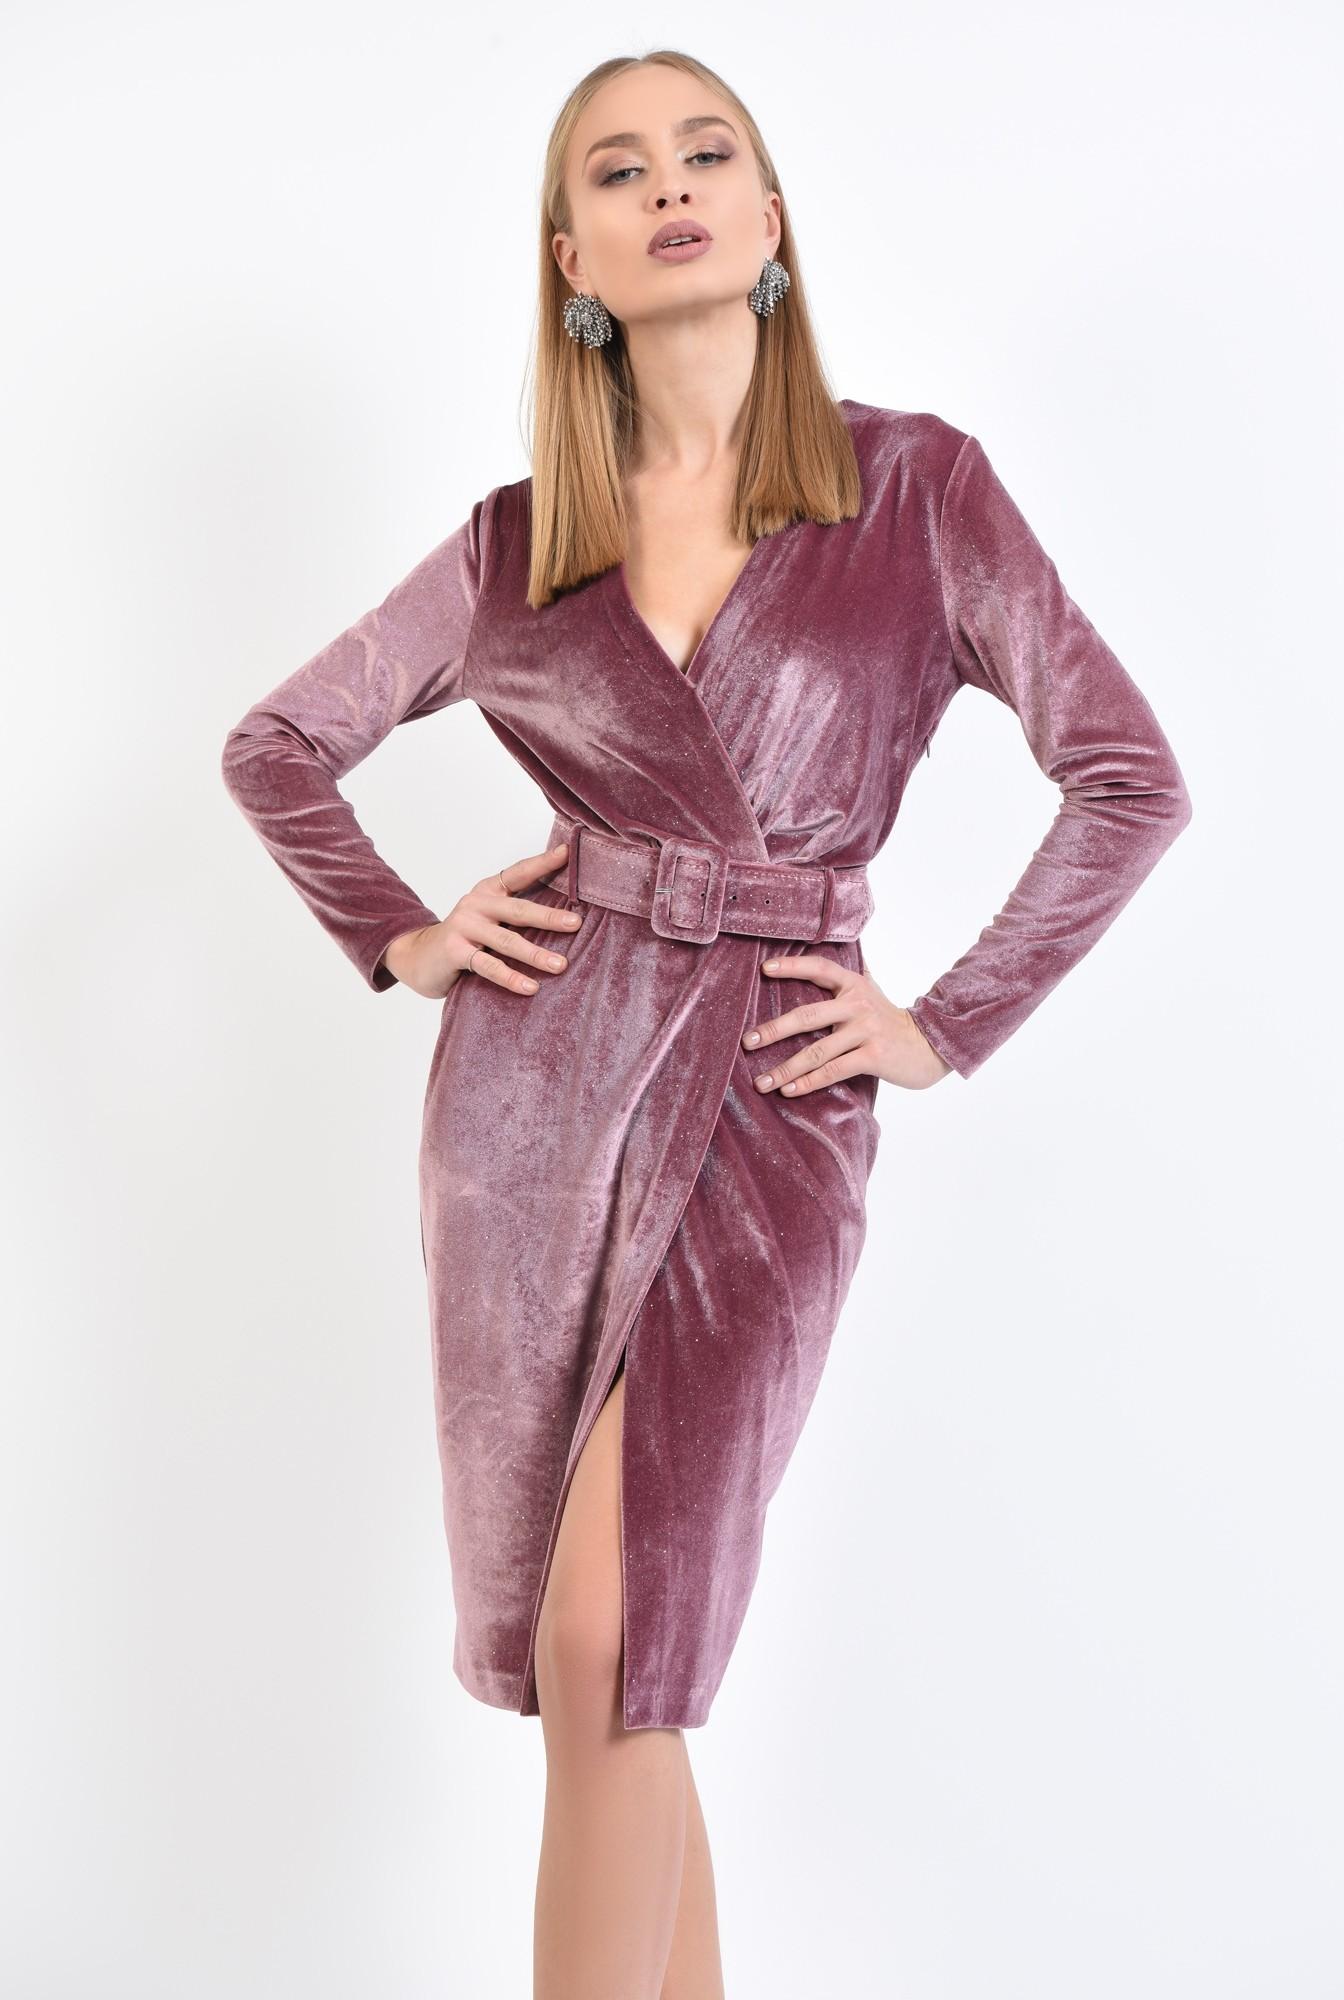 0 - 360 - rochie eleganta, croi conic, anchior petrecut, curea lata